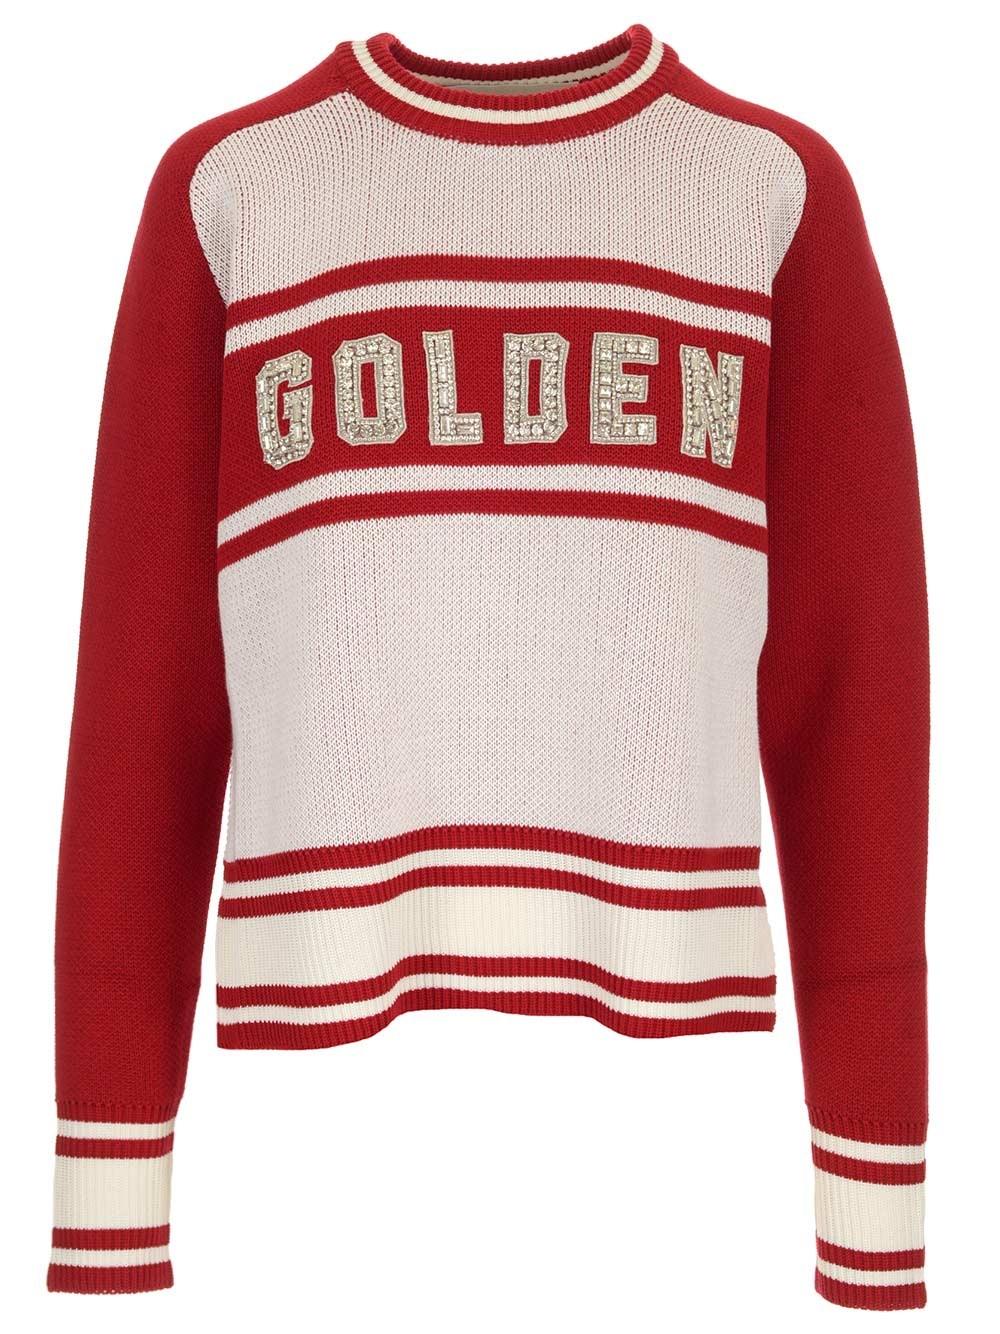 "GOLDEN GOOSE DELUXE BRAND ""Dianne"" Sweater"